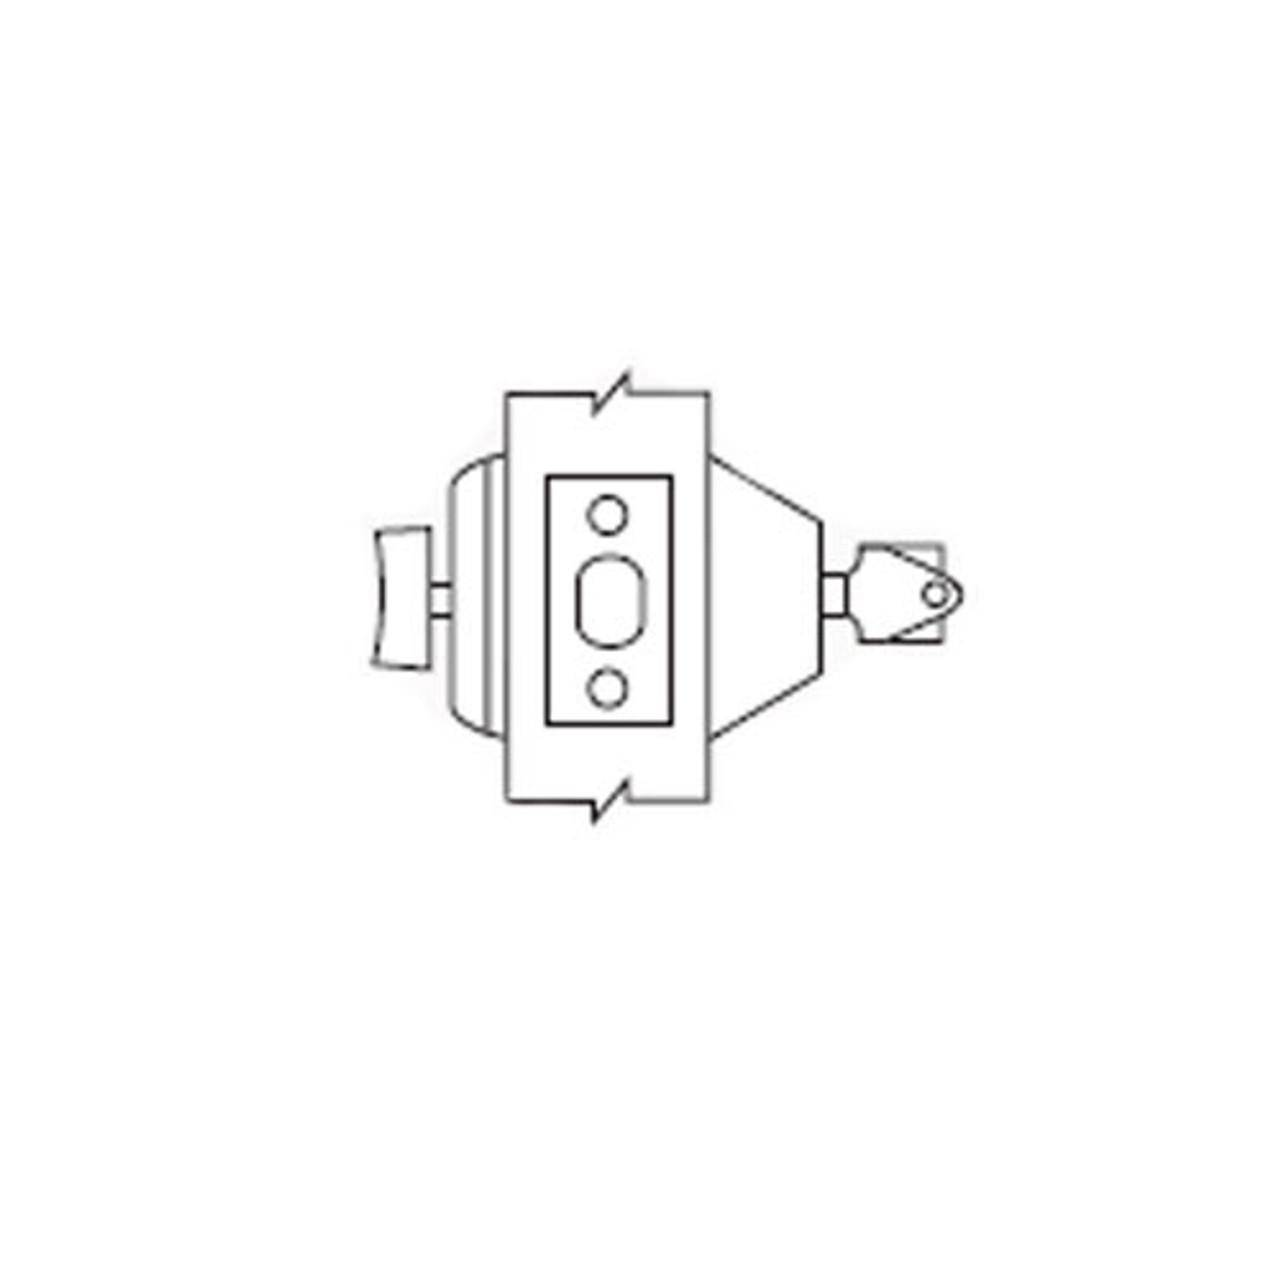 small resolution of d61 10b arrow lock d series deadbolt single cylinder with thumbturn in dark oxidized satin